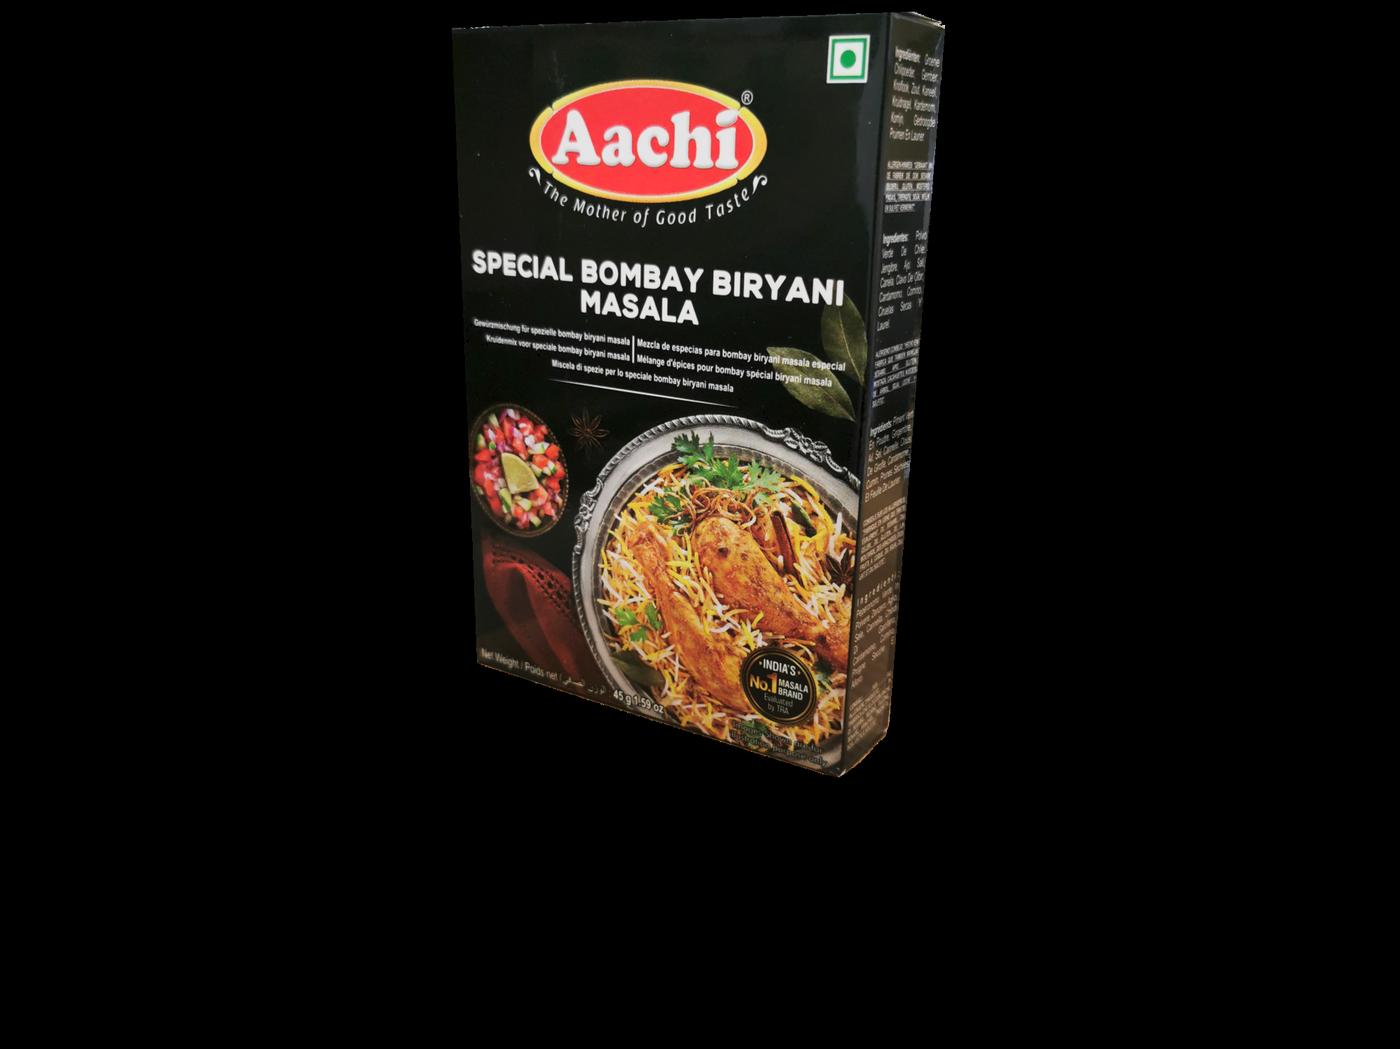 Aachi Special Bombay Biryani Masala